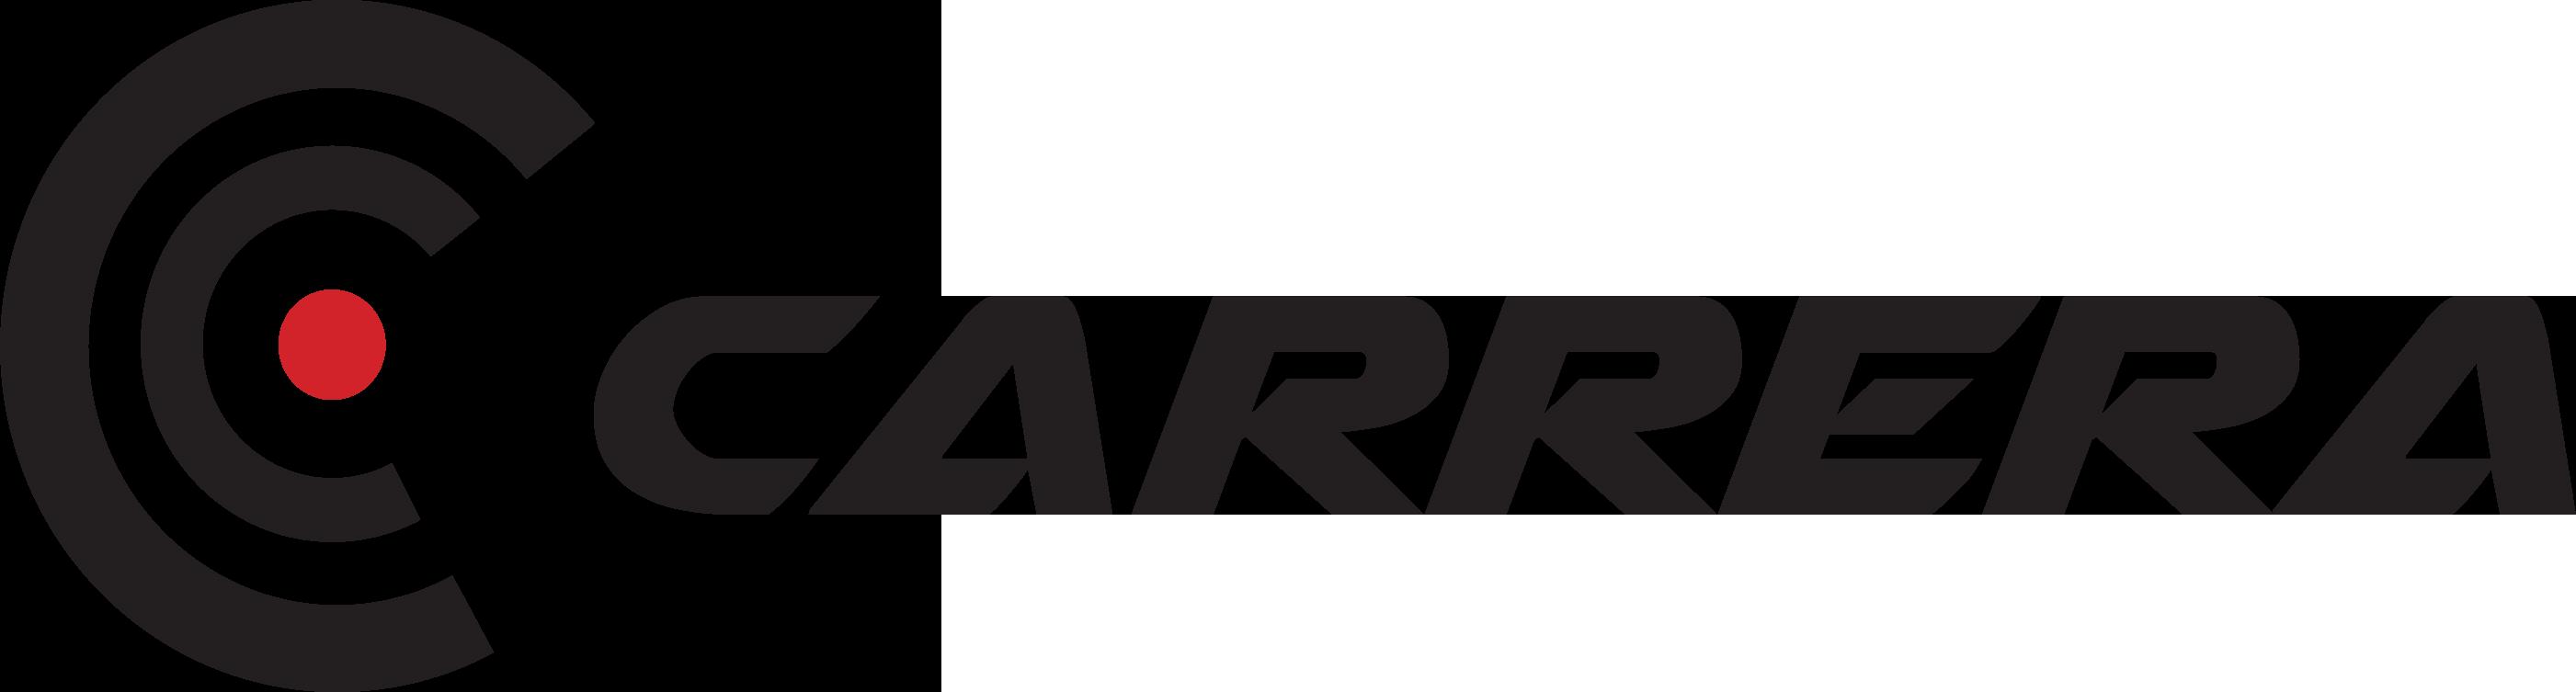 CARRERA ARMS CO LTD.